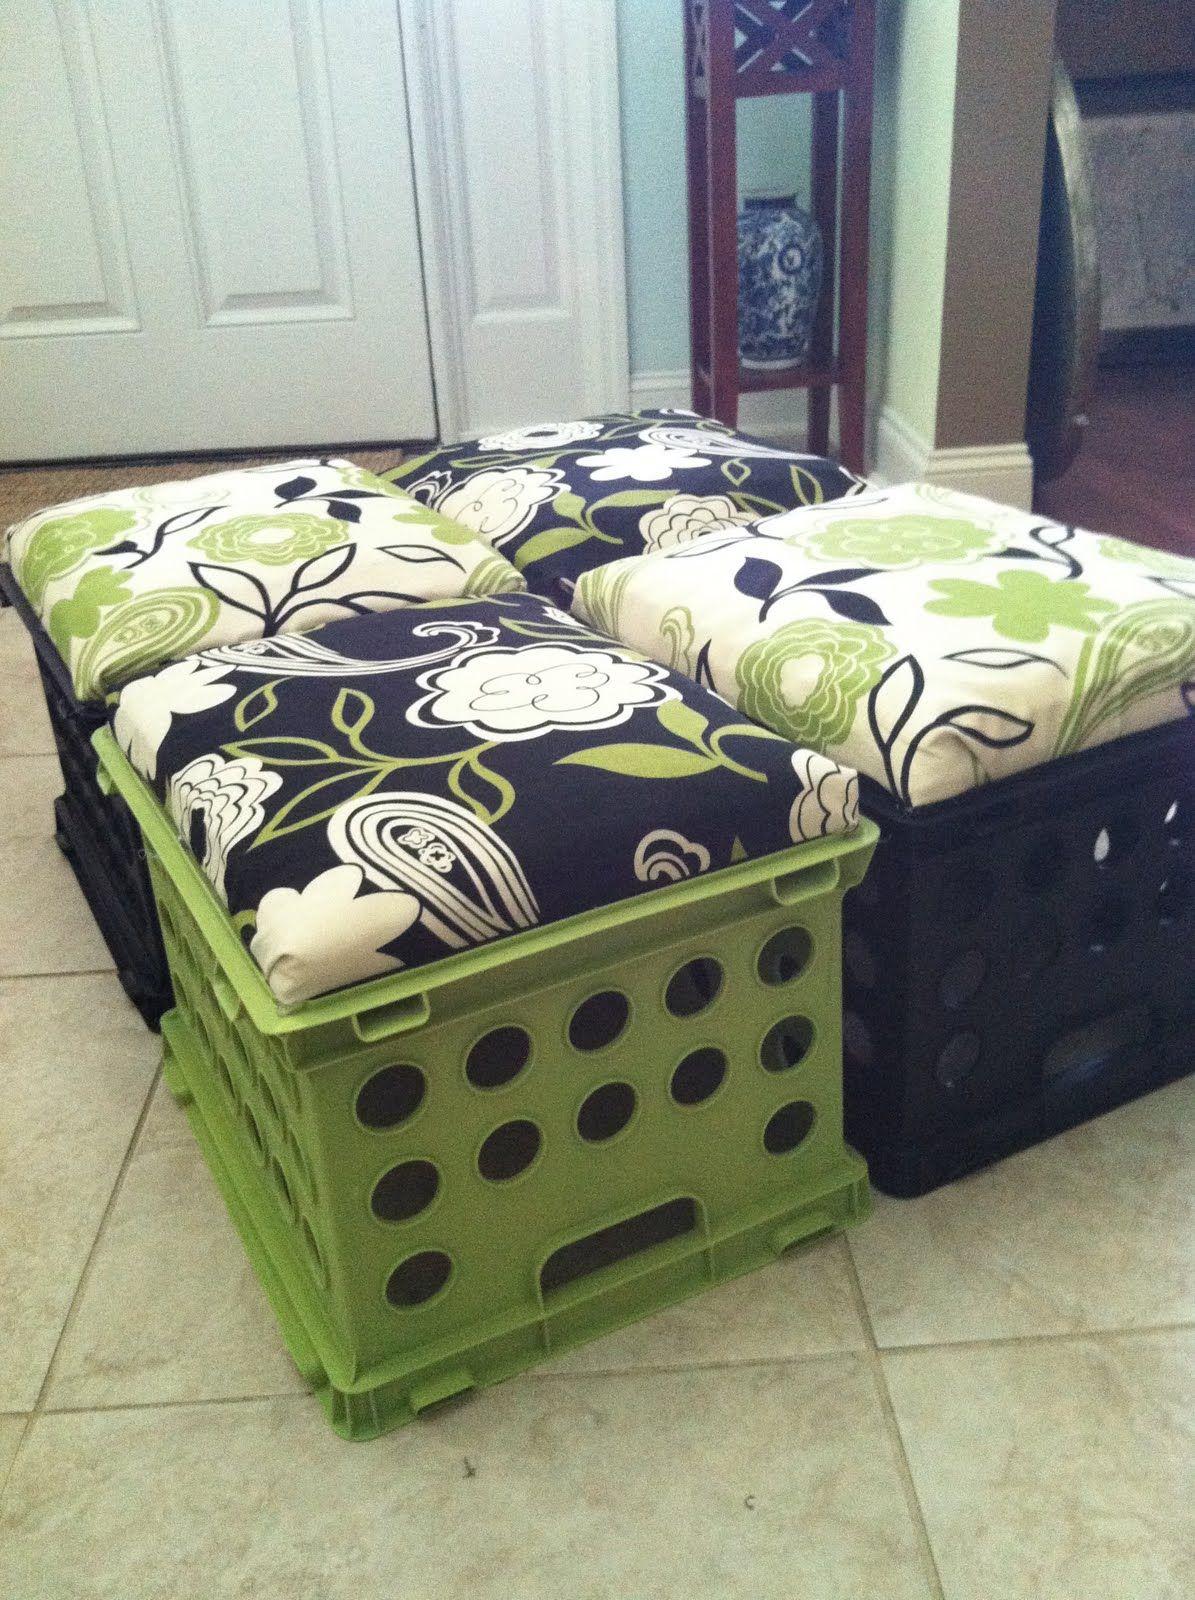 Superb 25 Easy Cheap Diy Dorm Decor Ideas Crate Seats Dorm Creativecarmelina Interior Chair Design Creativecarmelinacom